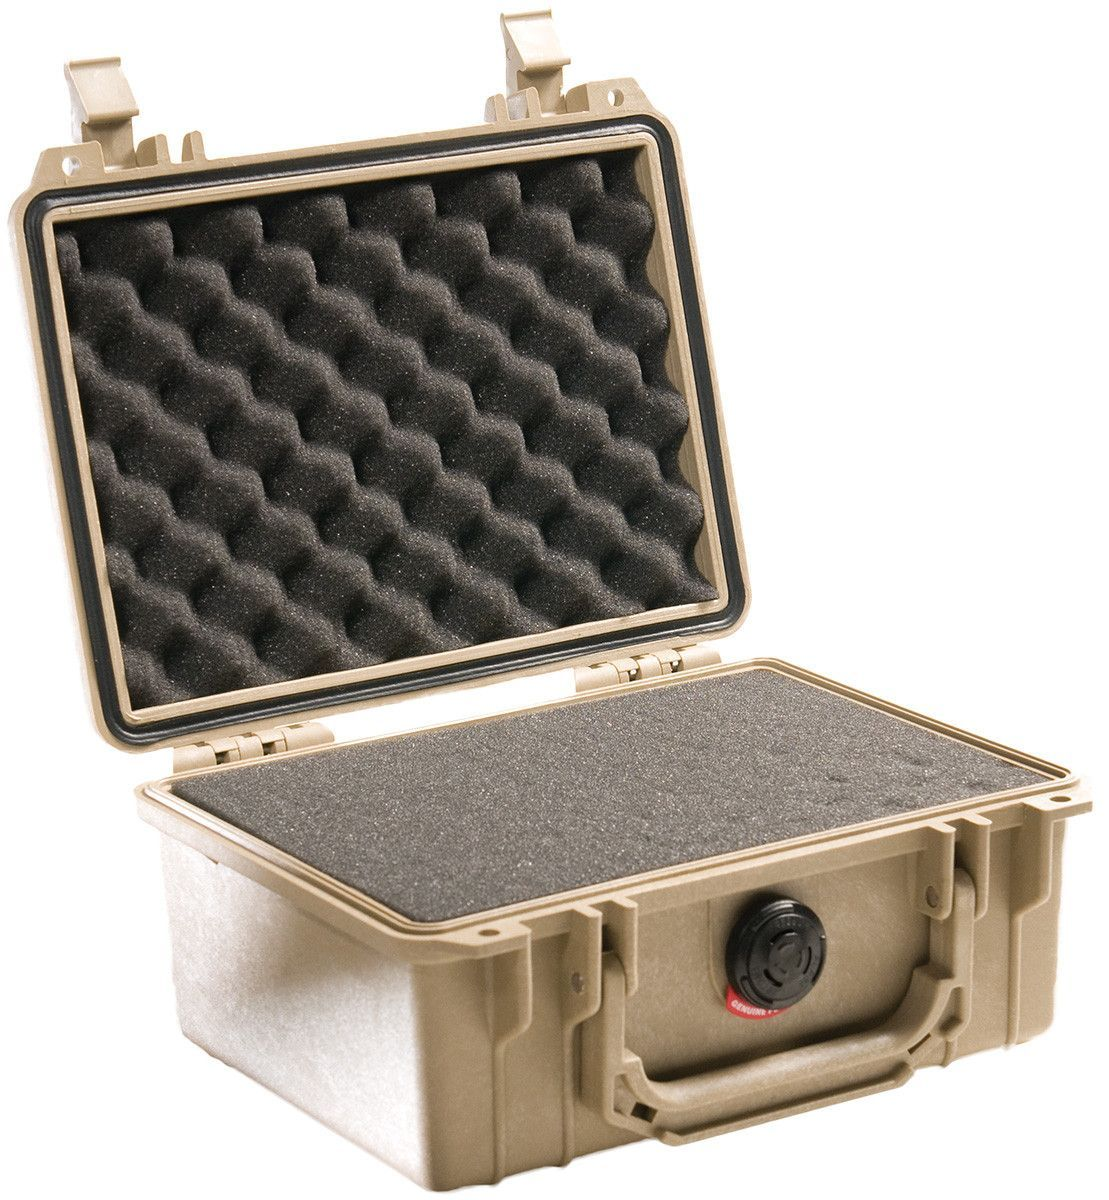 Pelican 1120 Case with Foam for Camera Orange